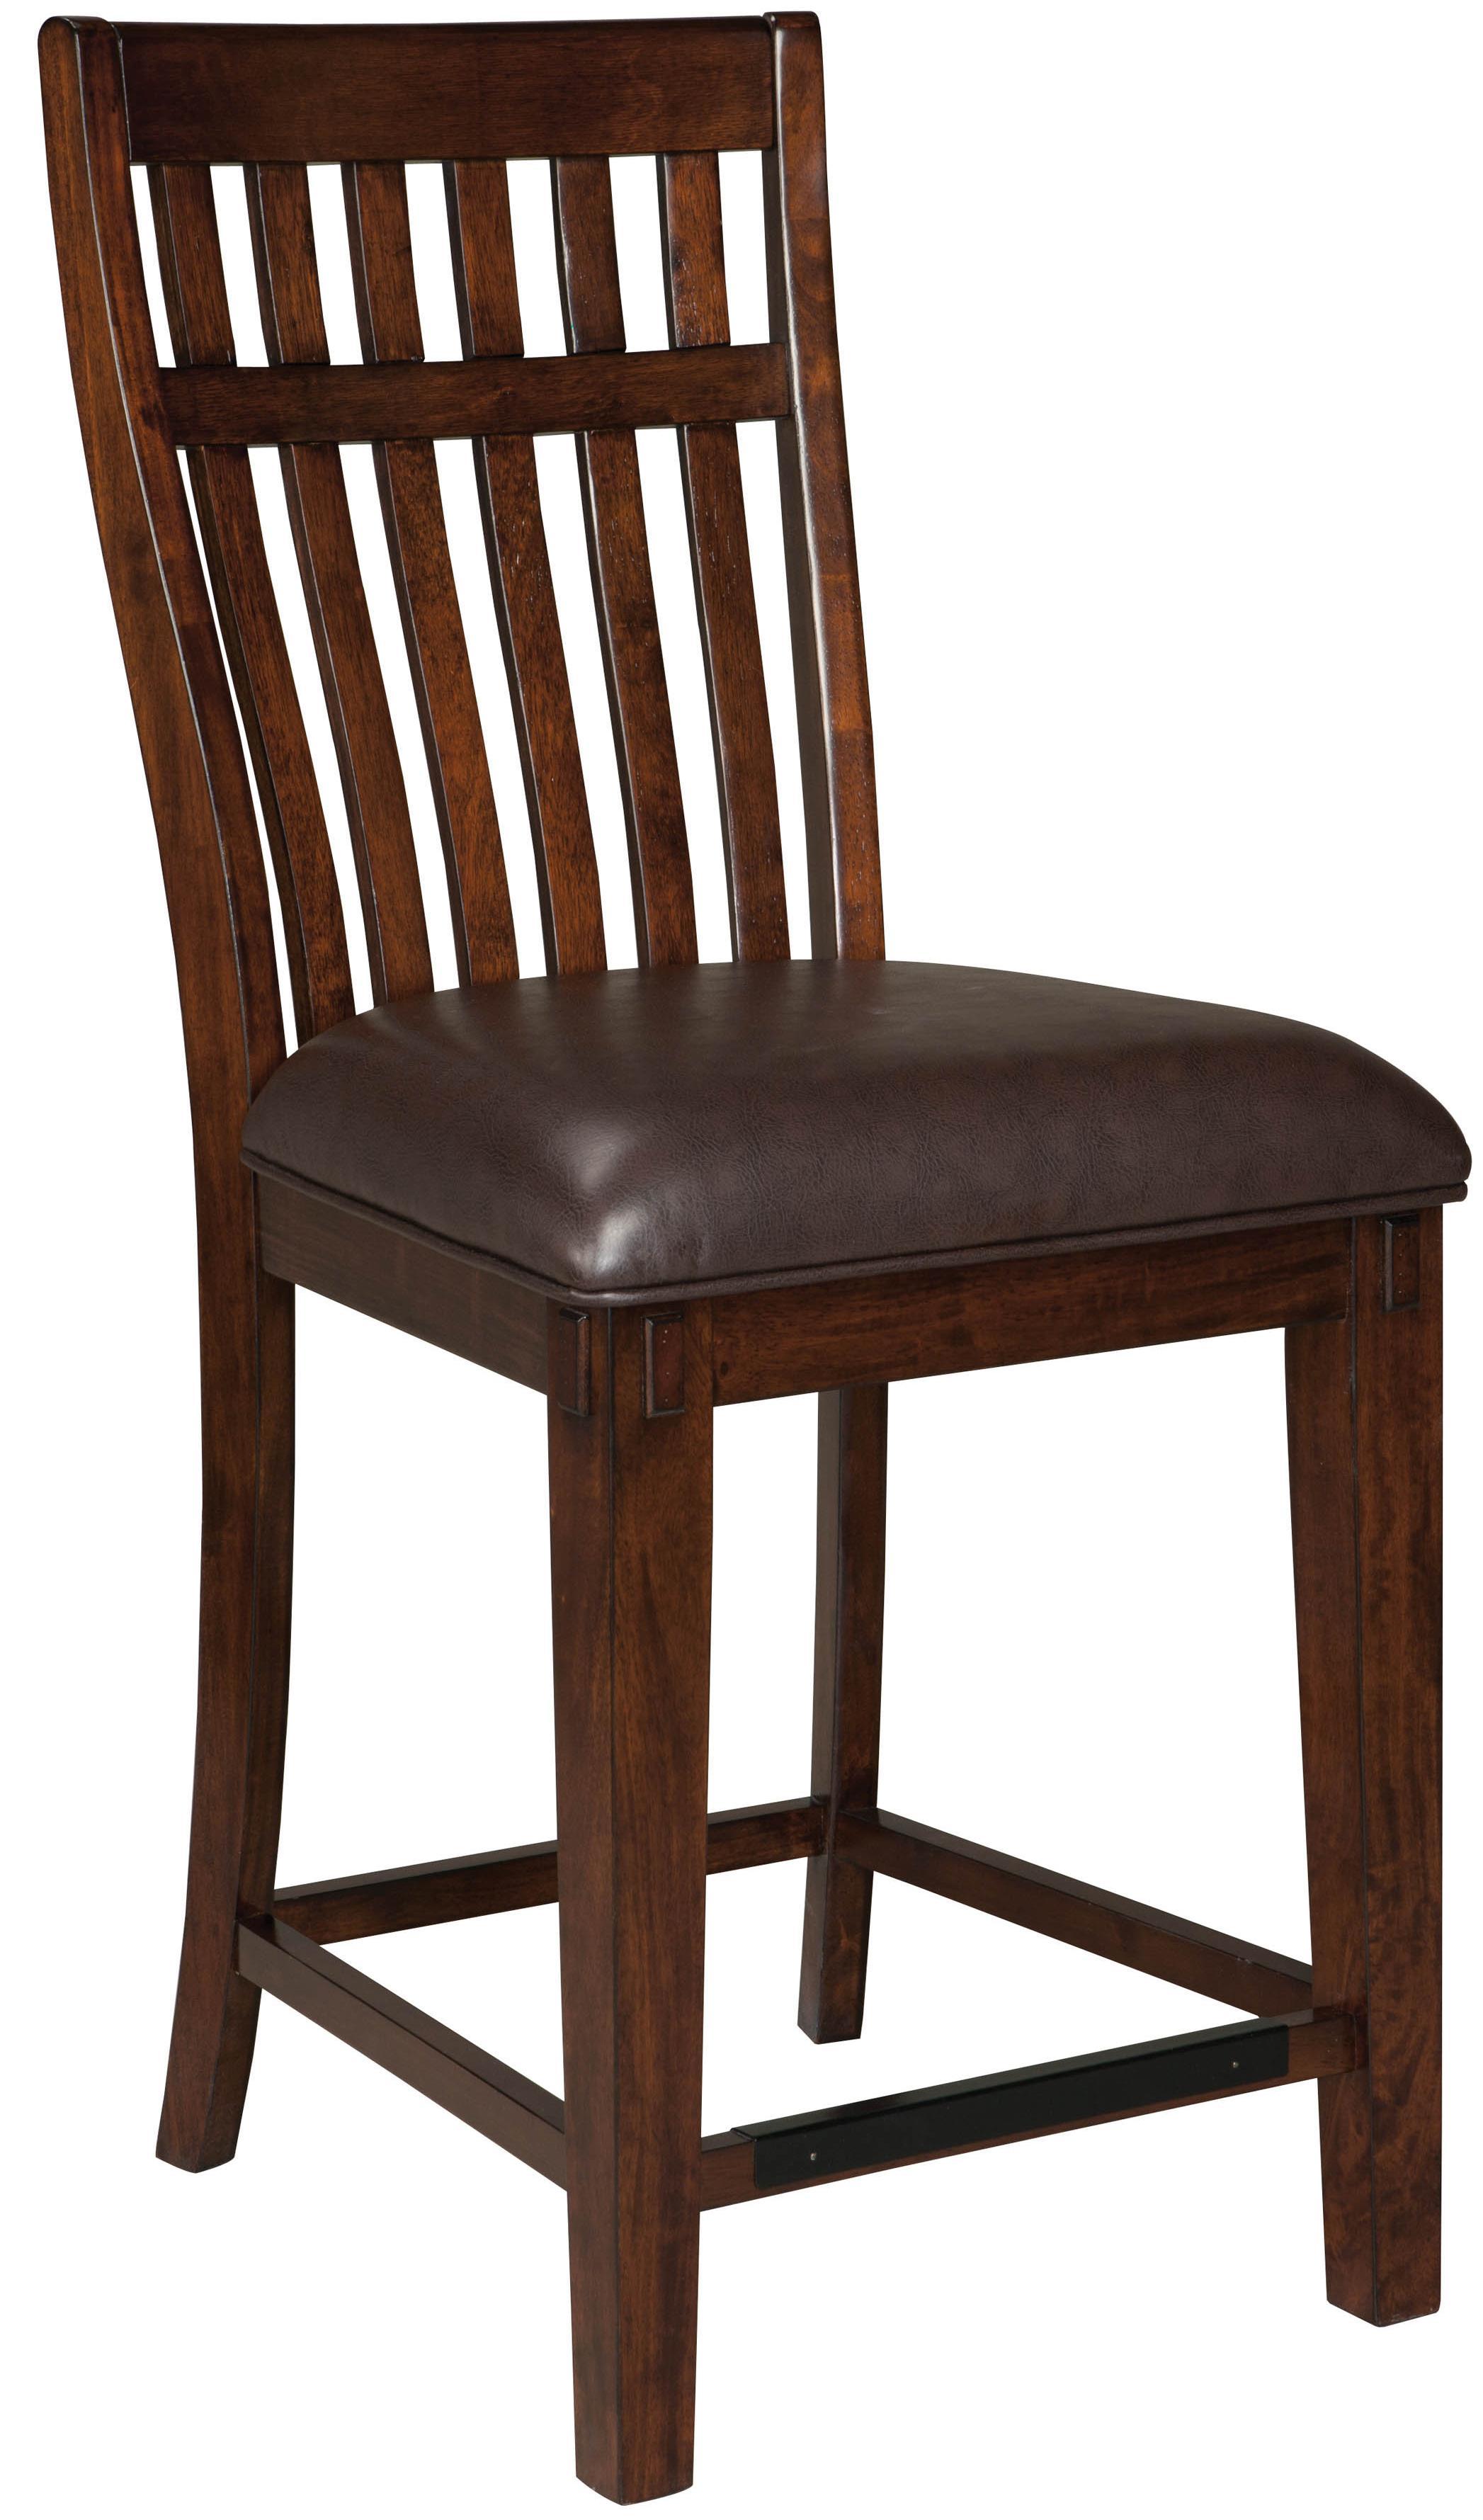 standard furniture artisan loft upholstered counter stool with 24 seat height olinde 39 s. Black Bedroom Furniture Sets. Home Design Ideas